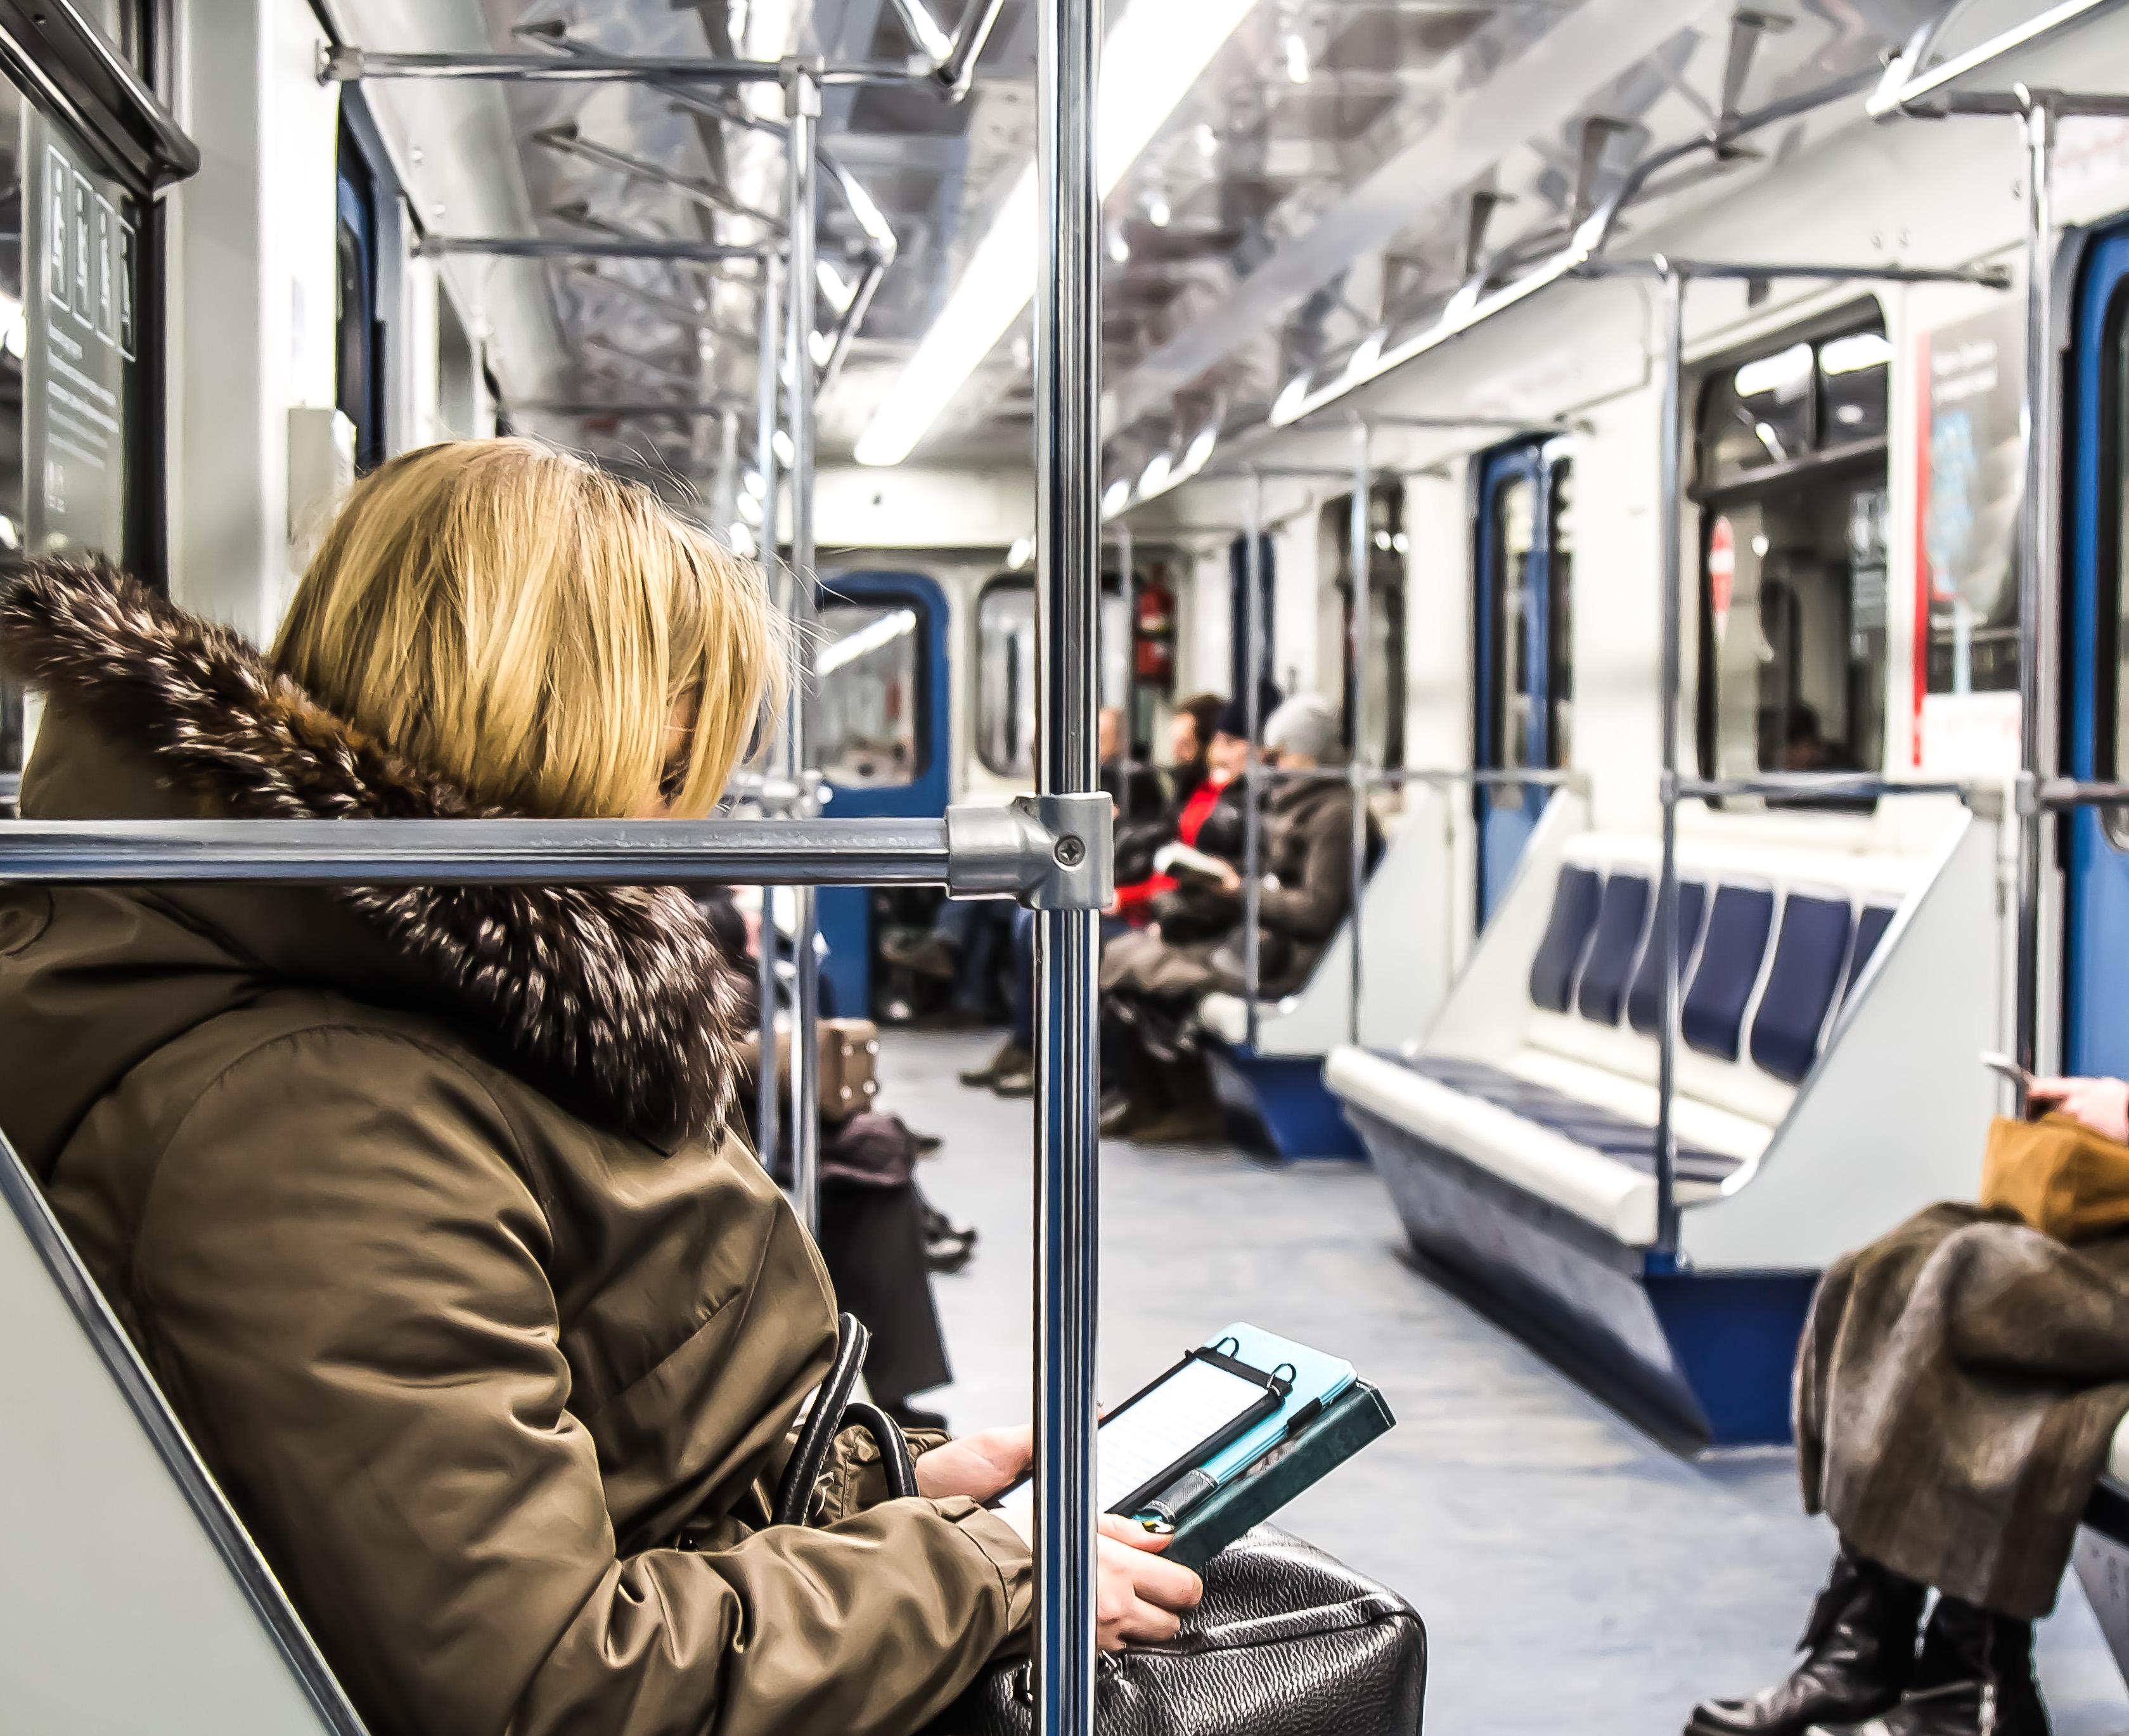 Moscow festive train metro